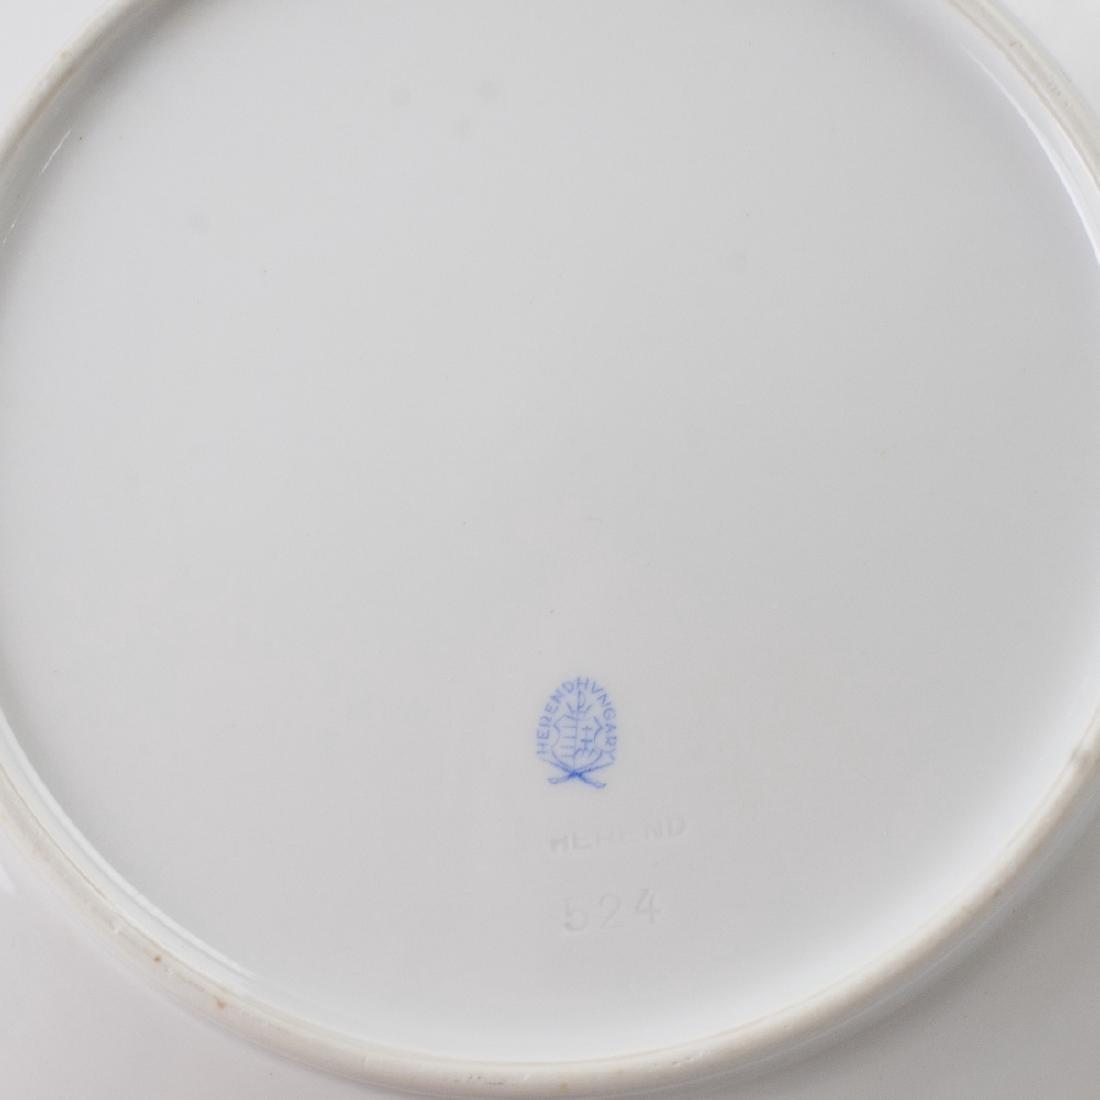 Herend Porcelain Dinner Plates - 5